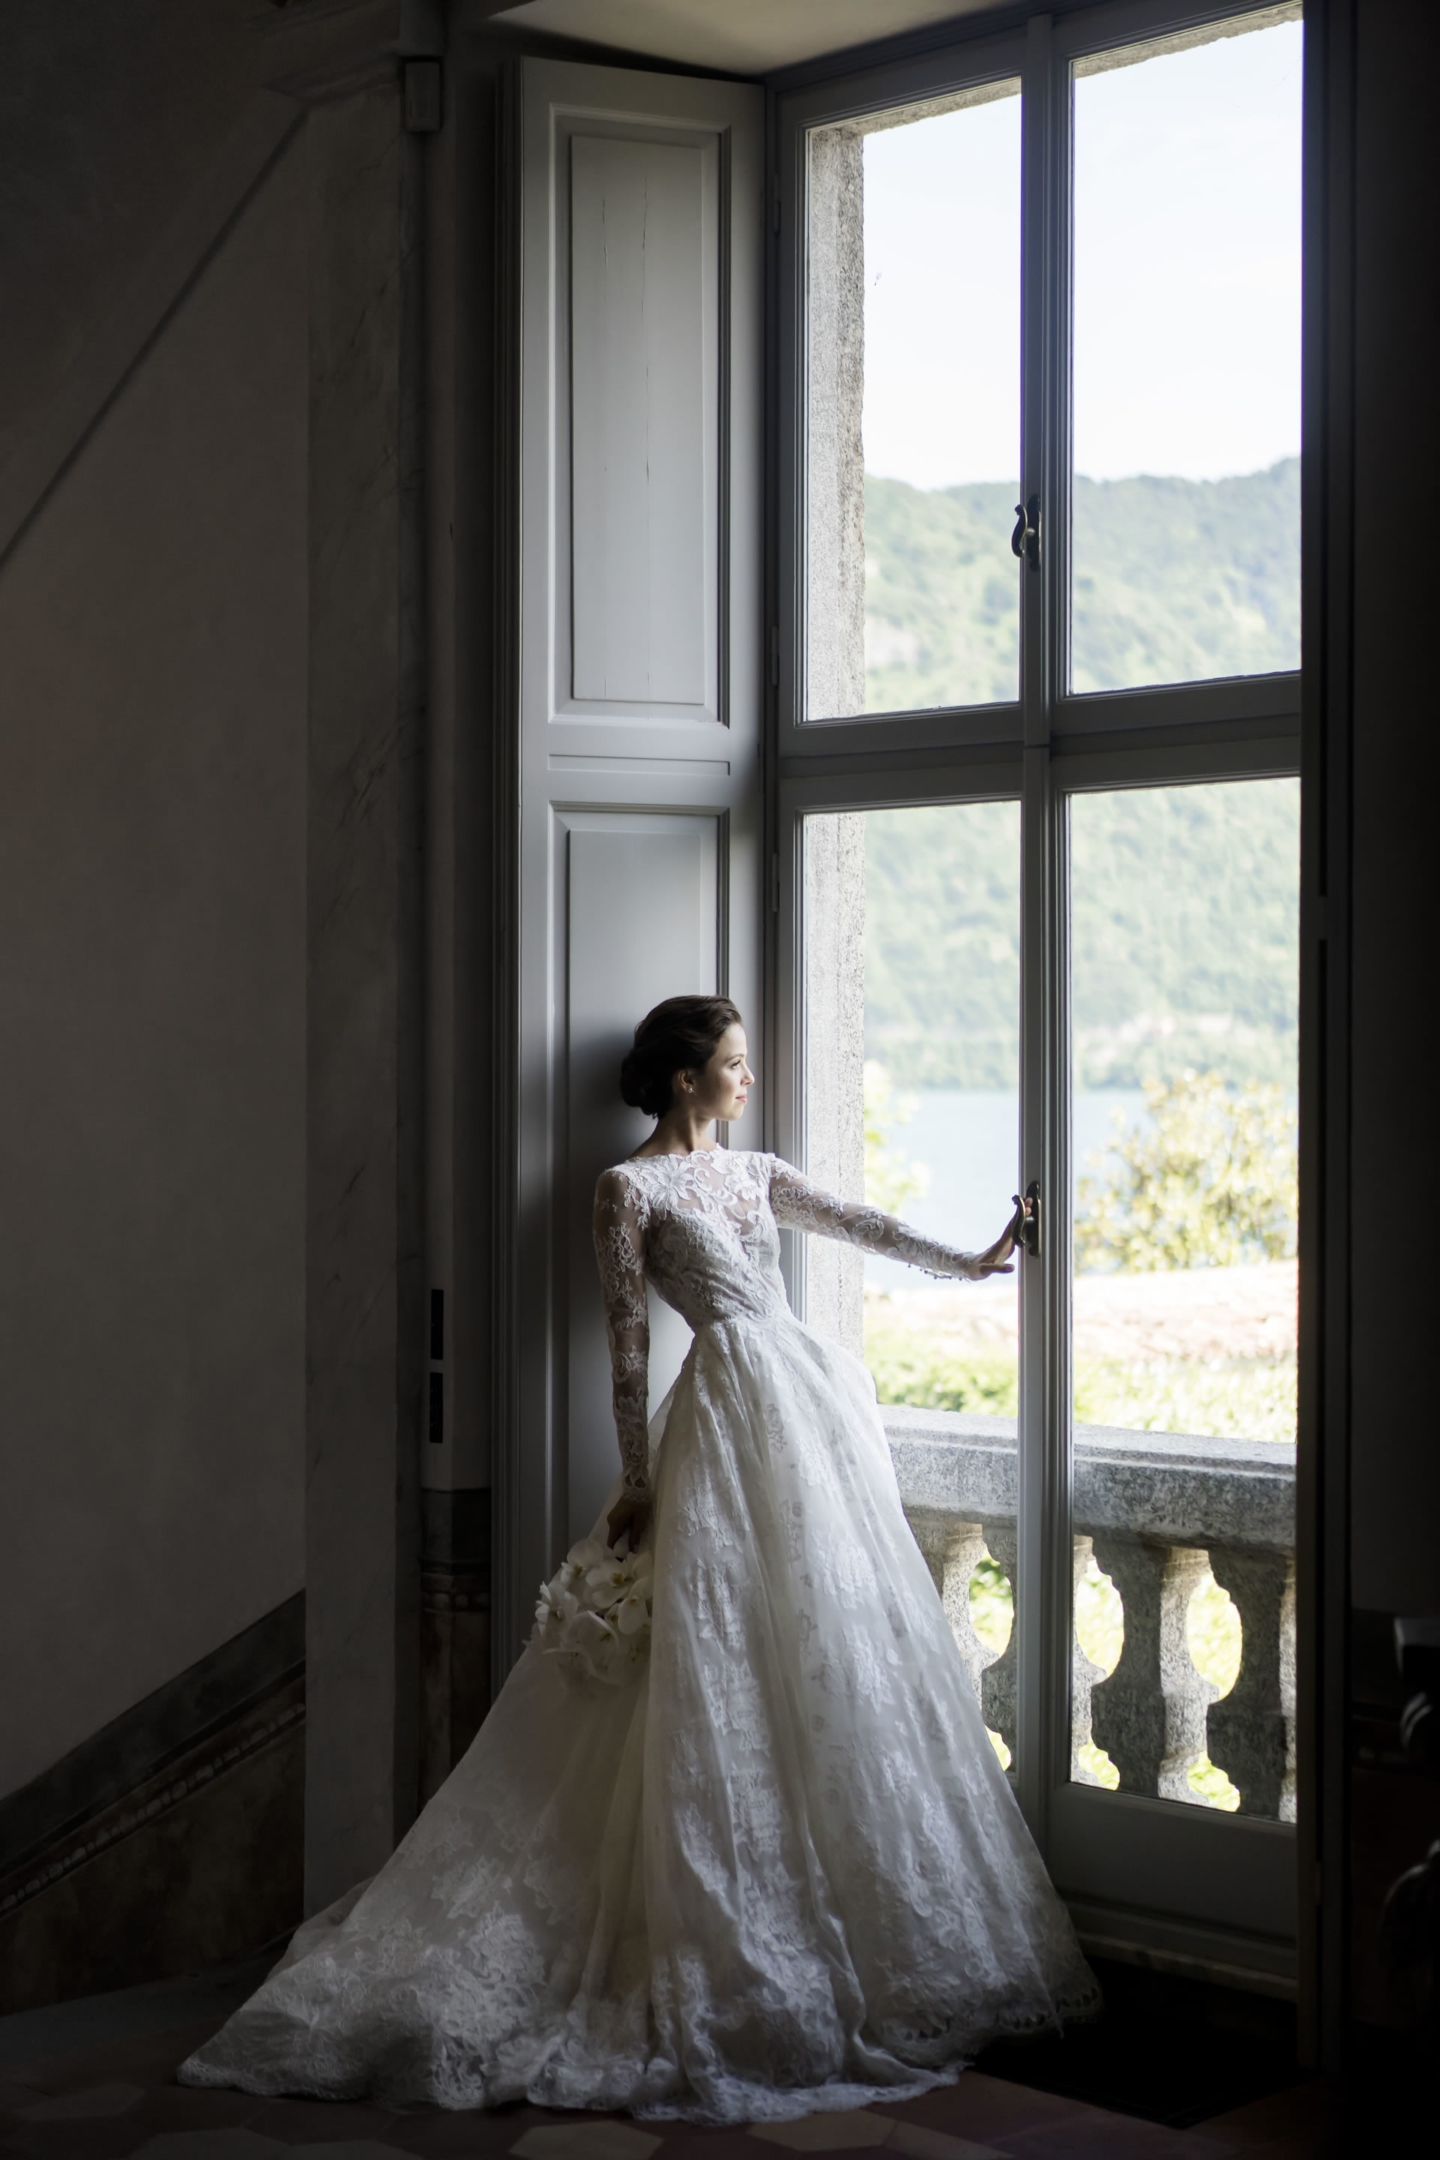 - 49 :: A spectacular wedding: mother Russia on Como lake :: Luxury wedding photography - 48 ::  - 49